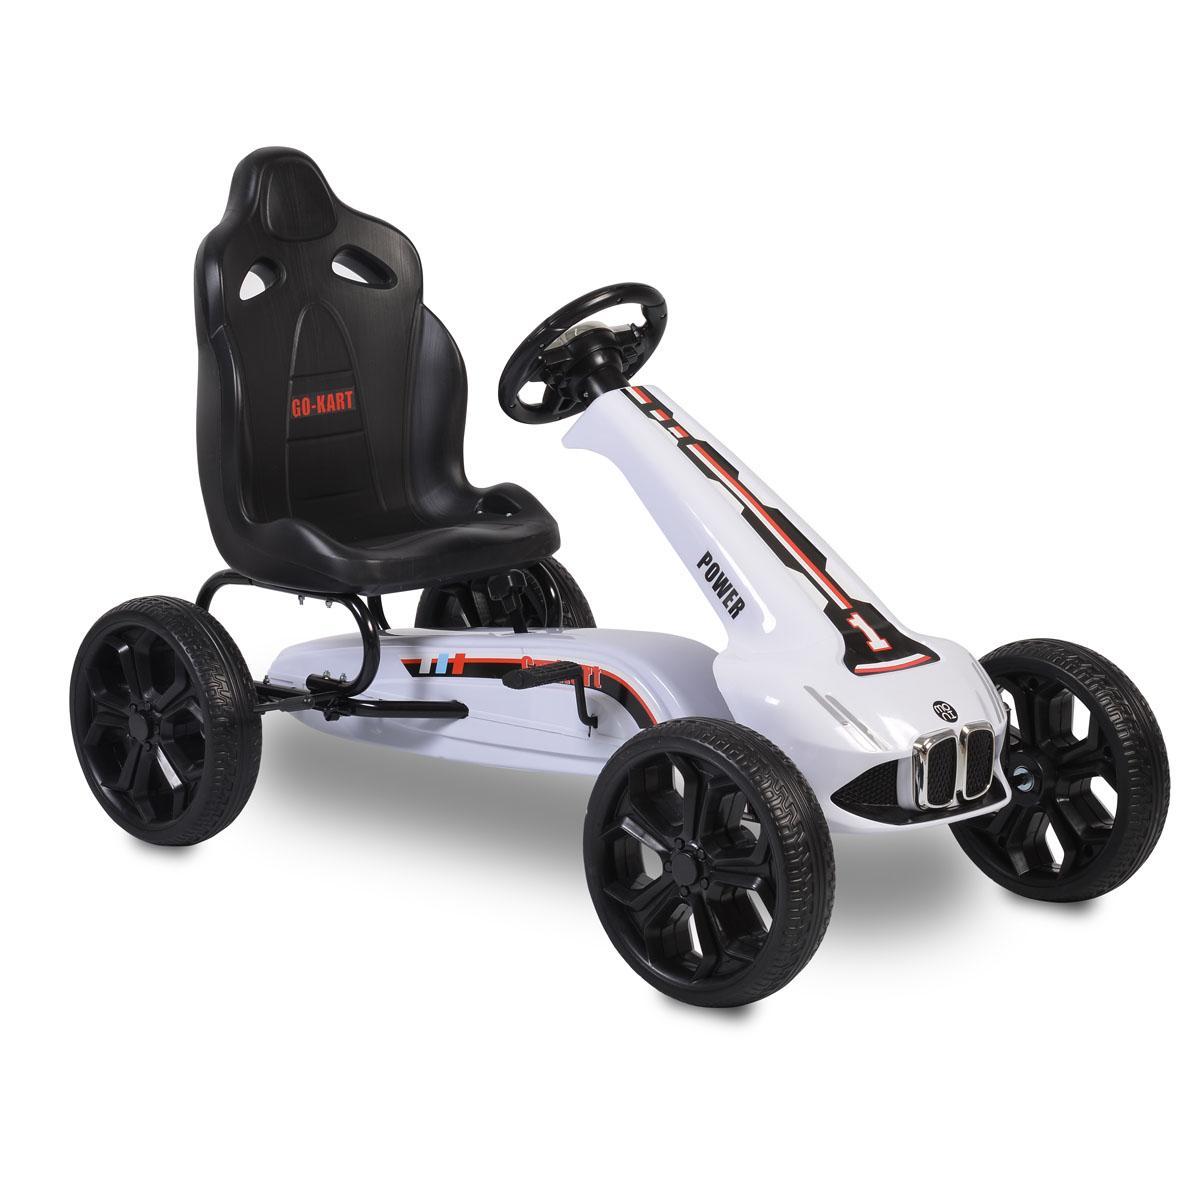 Cangaroo Αυτοκινητάκι με πετάλια Go Cart Monte Carlo white